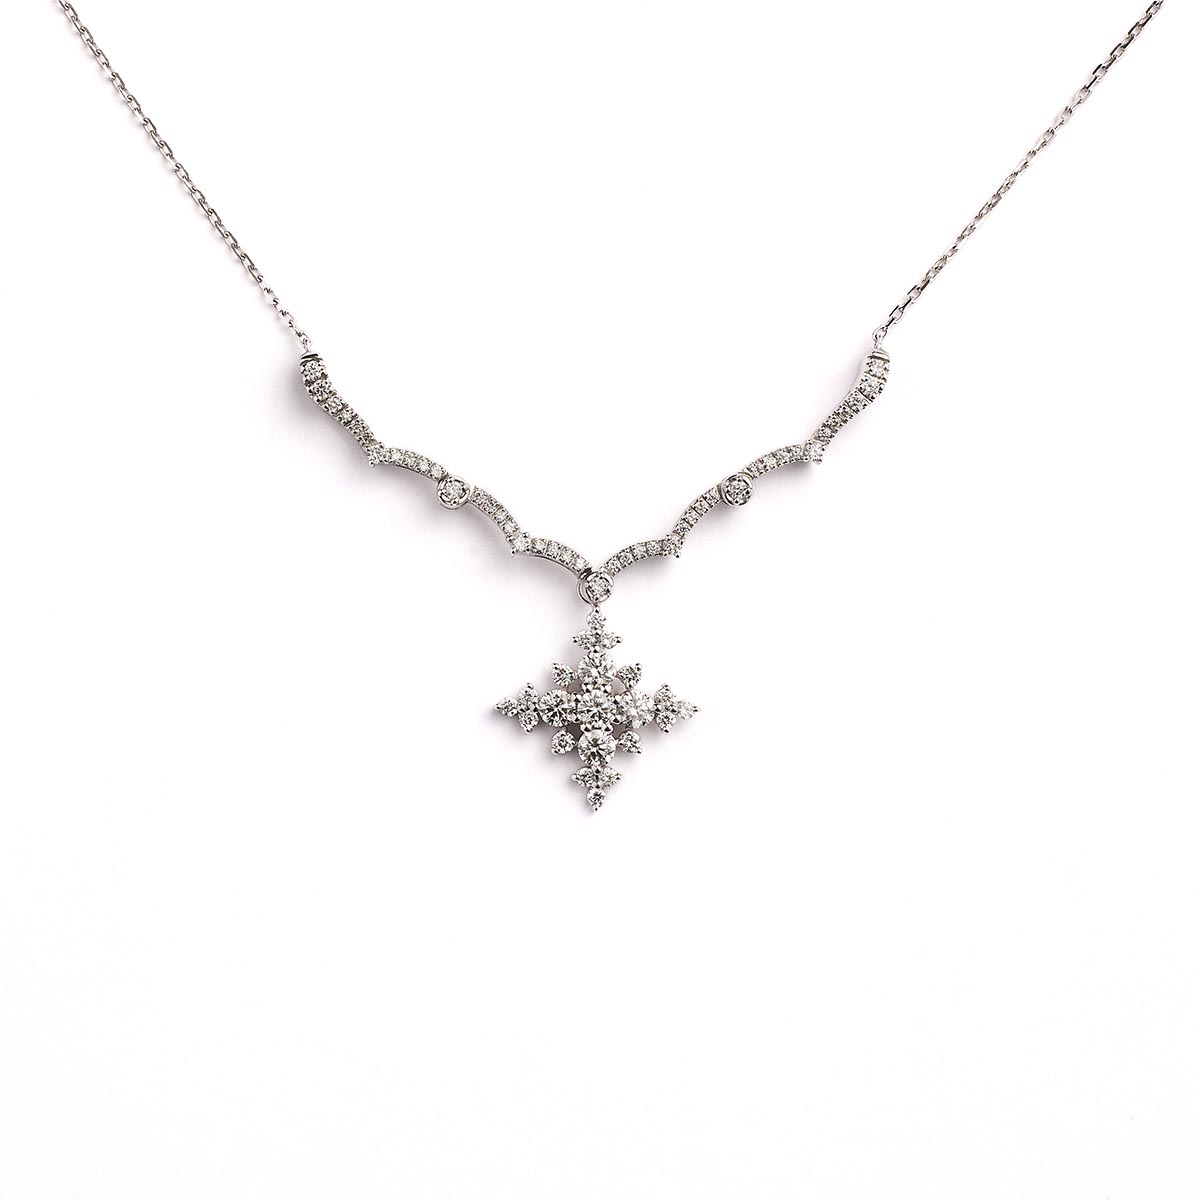 K18WG Diamond Pendant